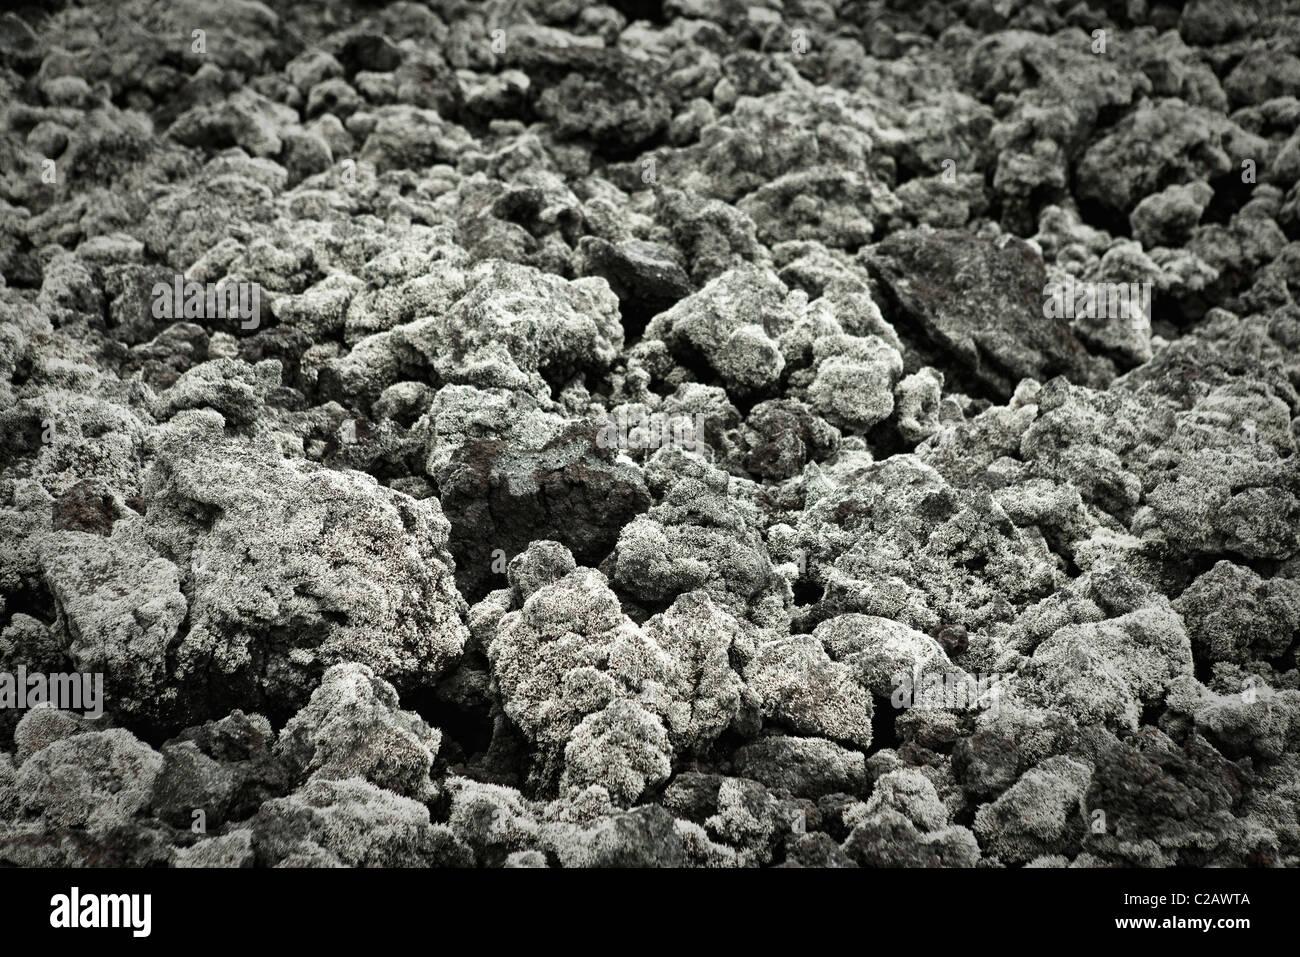 Lava field, close-up - Stock Image